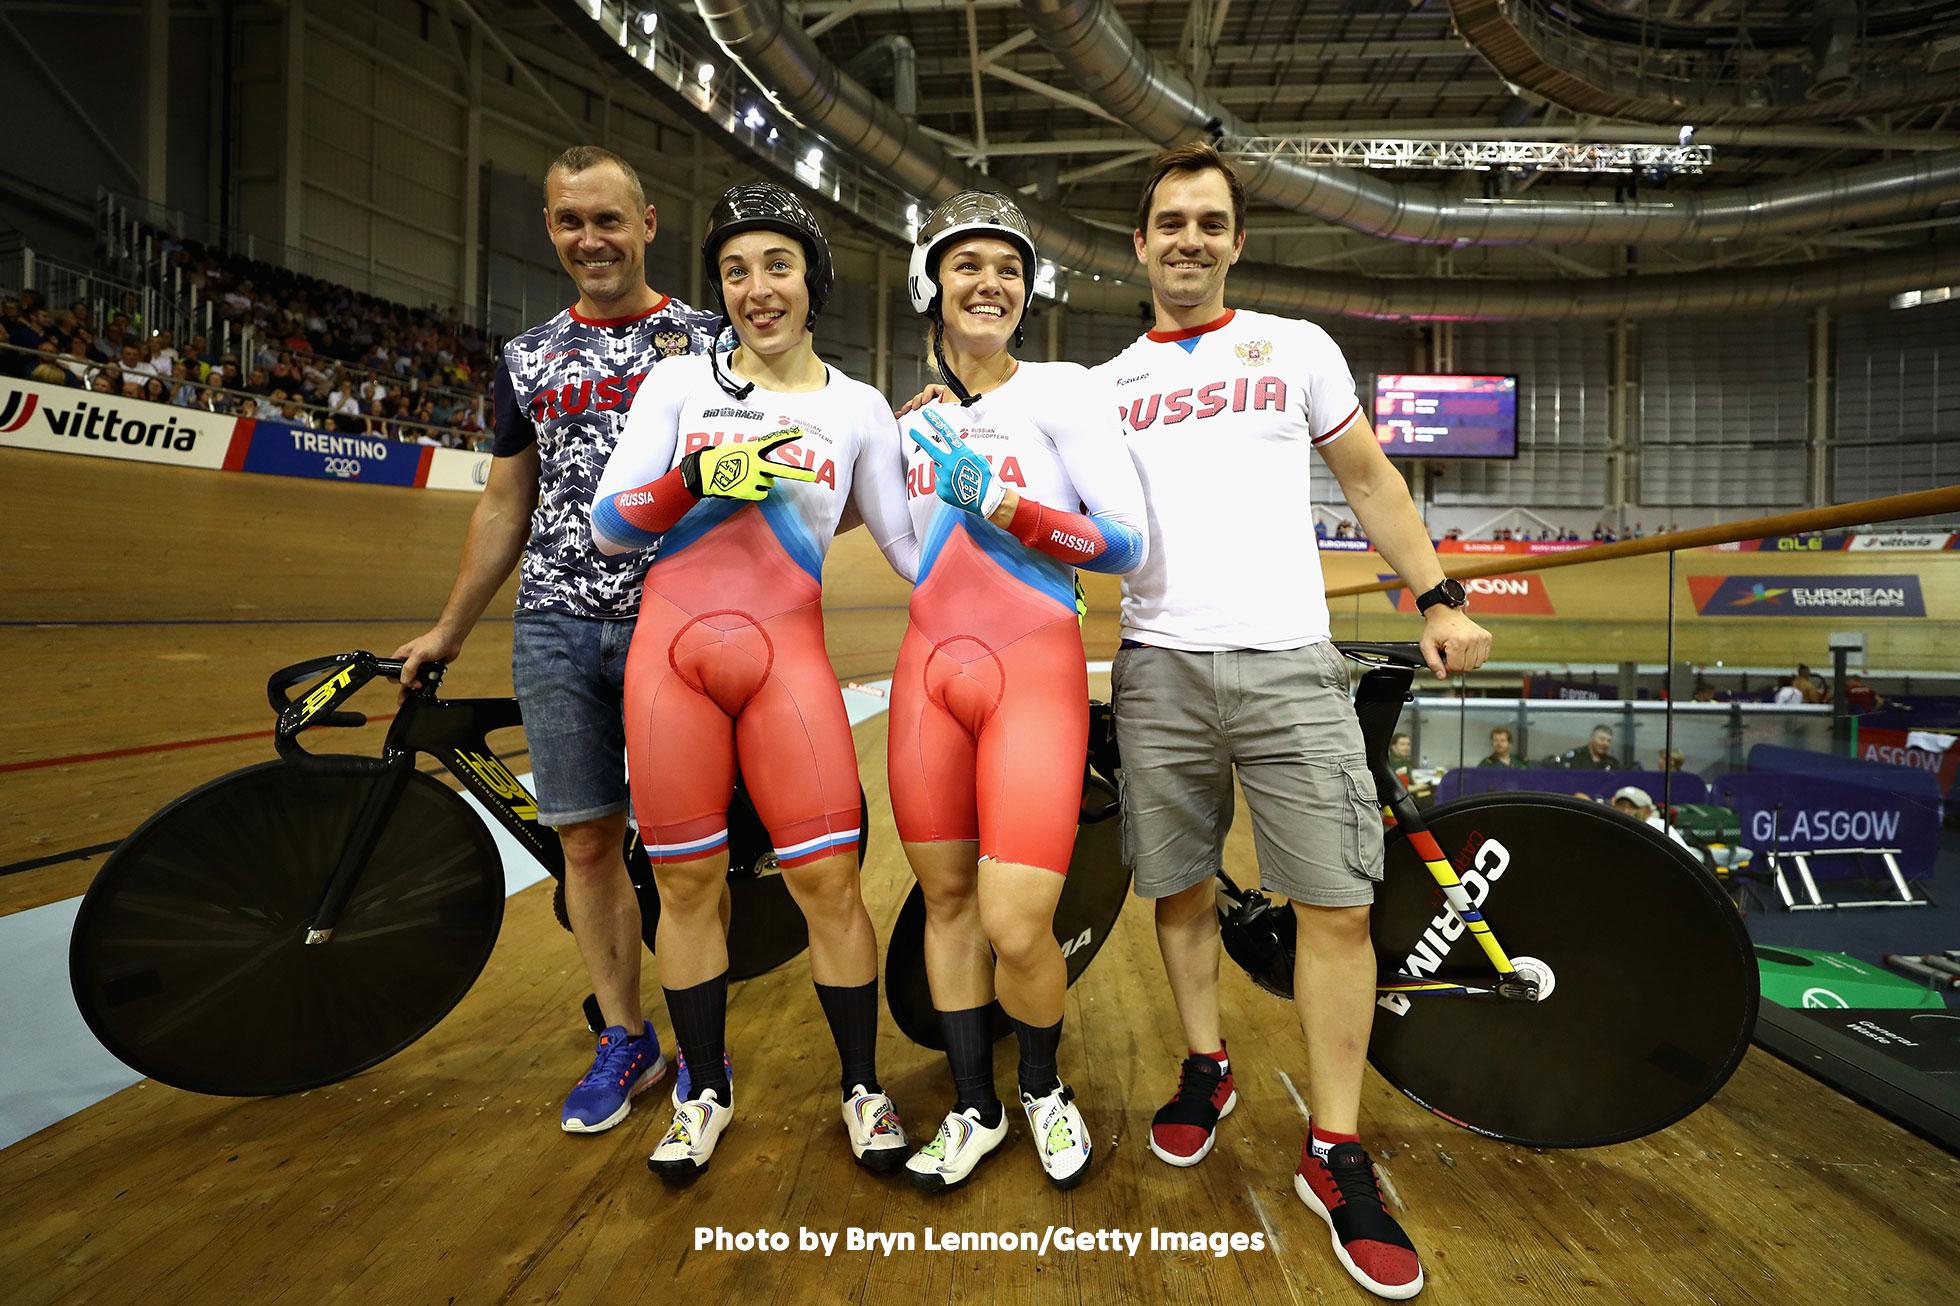 UECトラックヨーロッパ選手権2018・女子チームスプリント